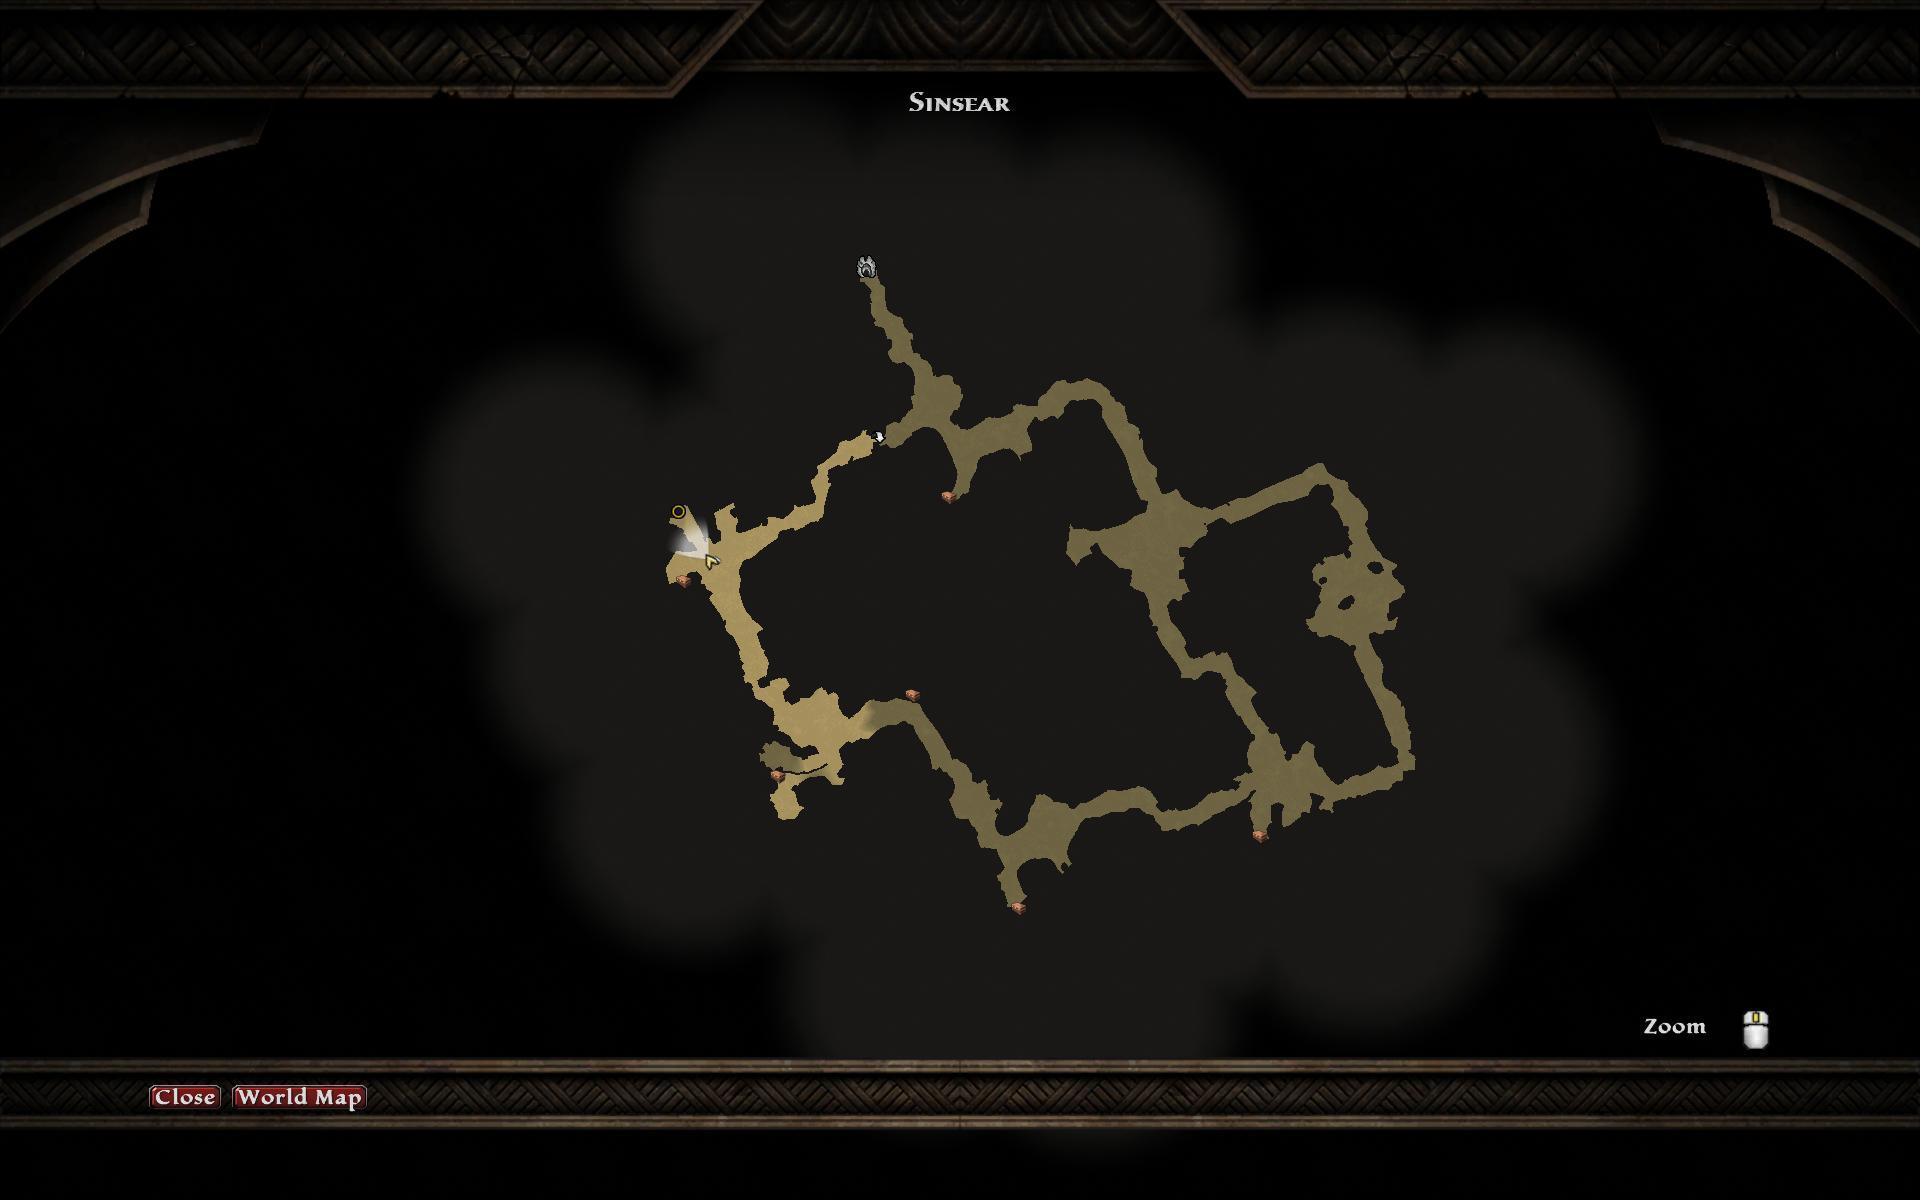 Sinsear Map.jpg